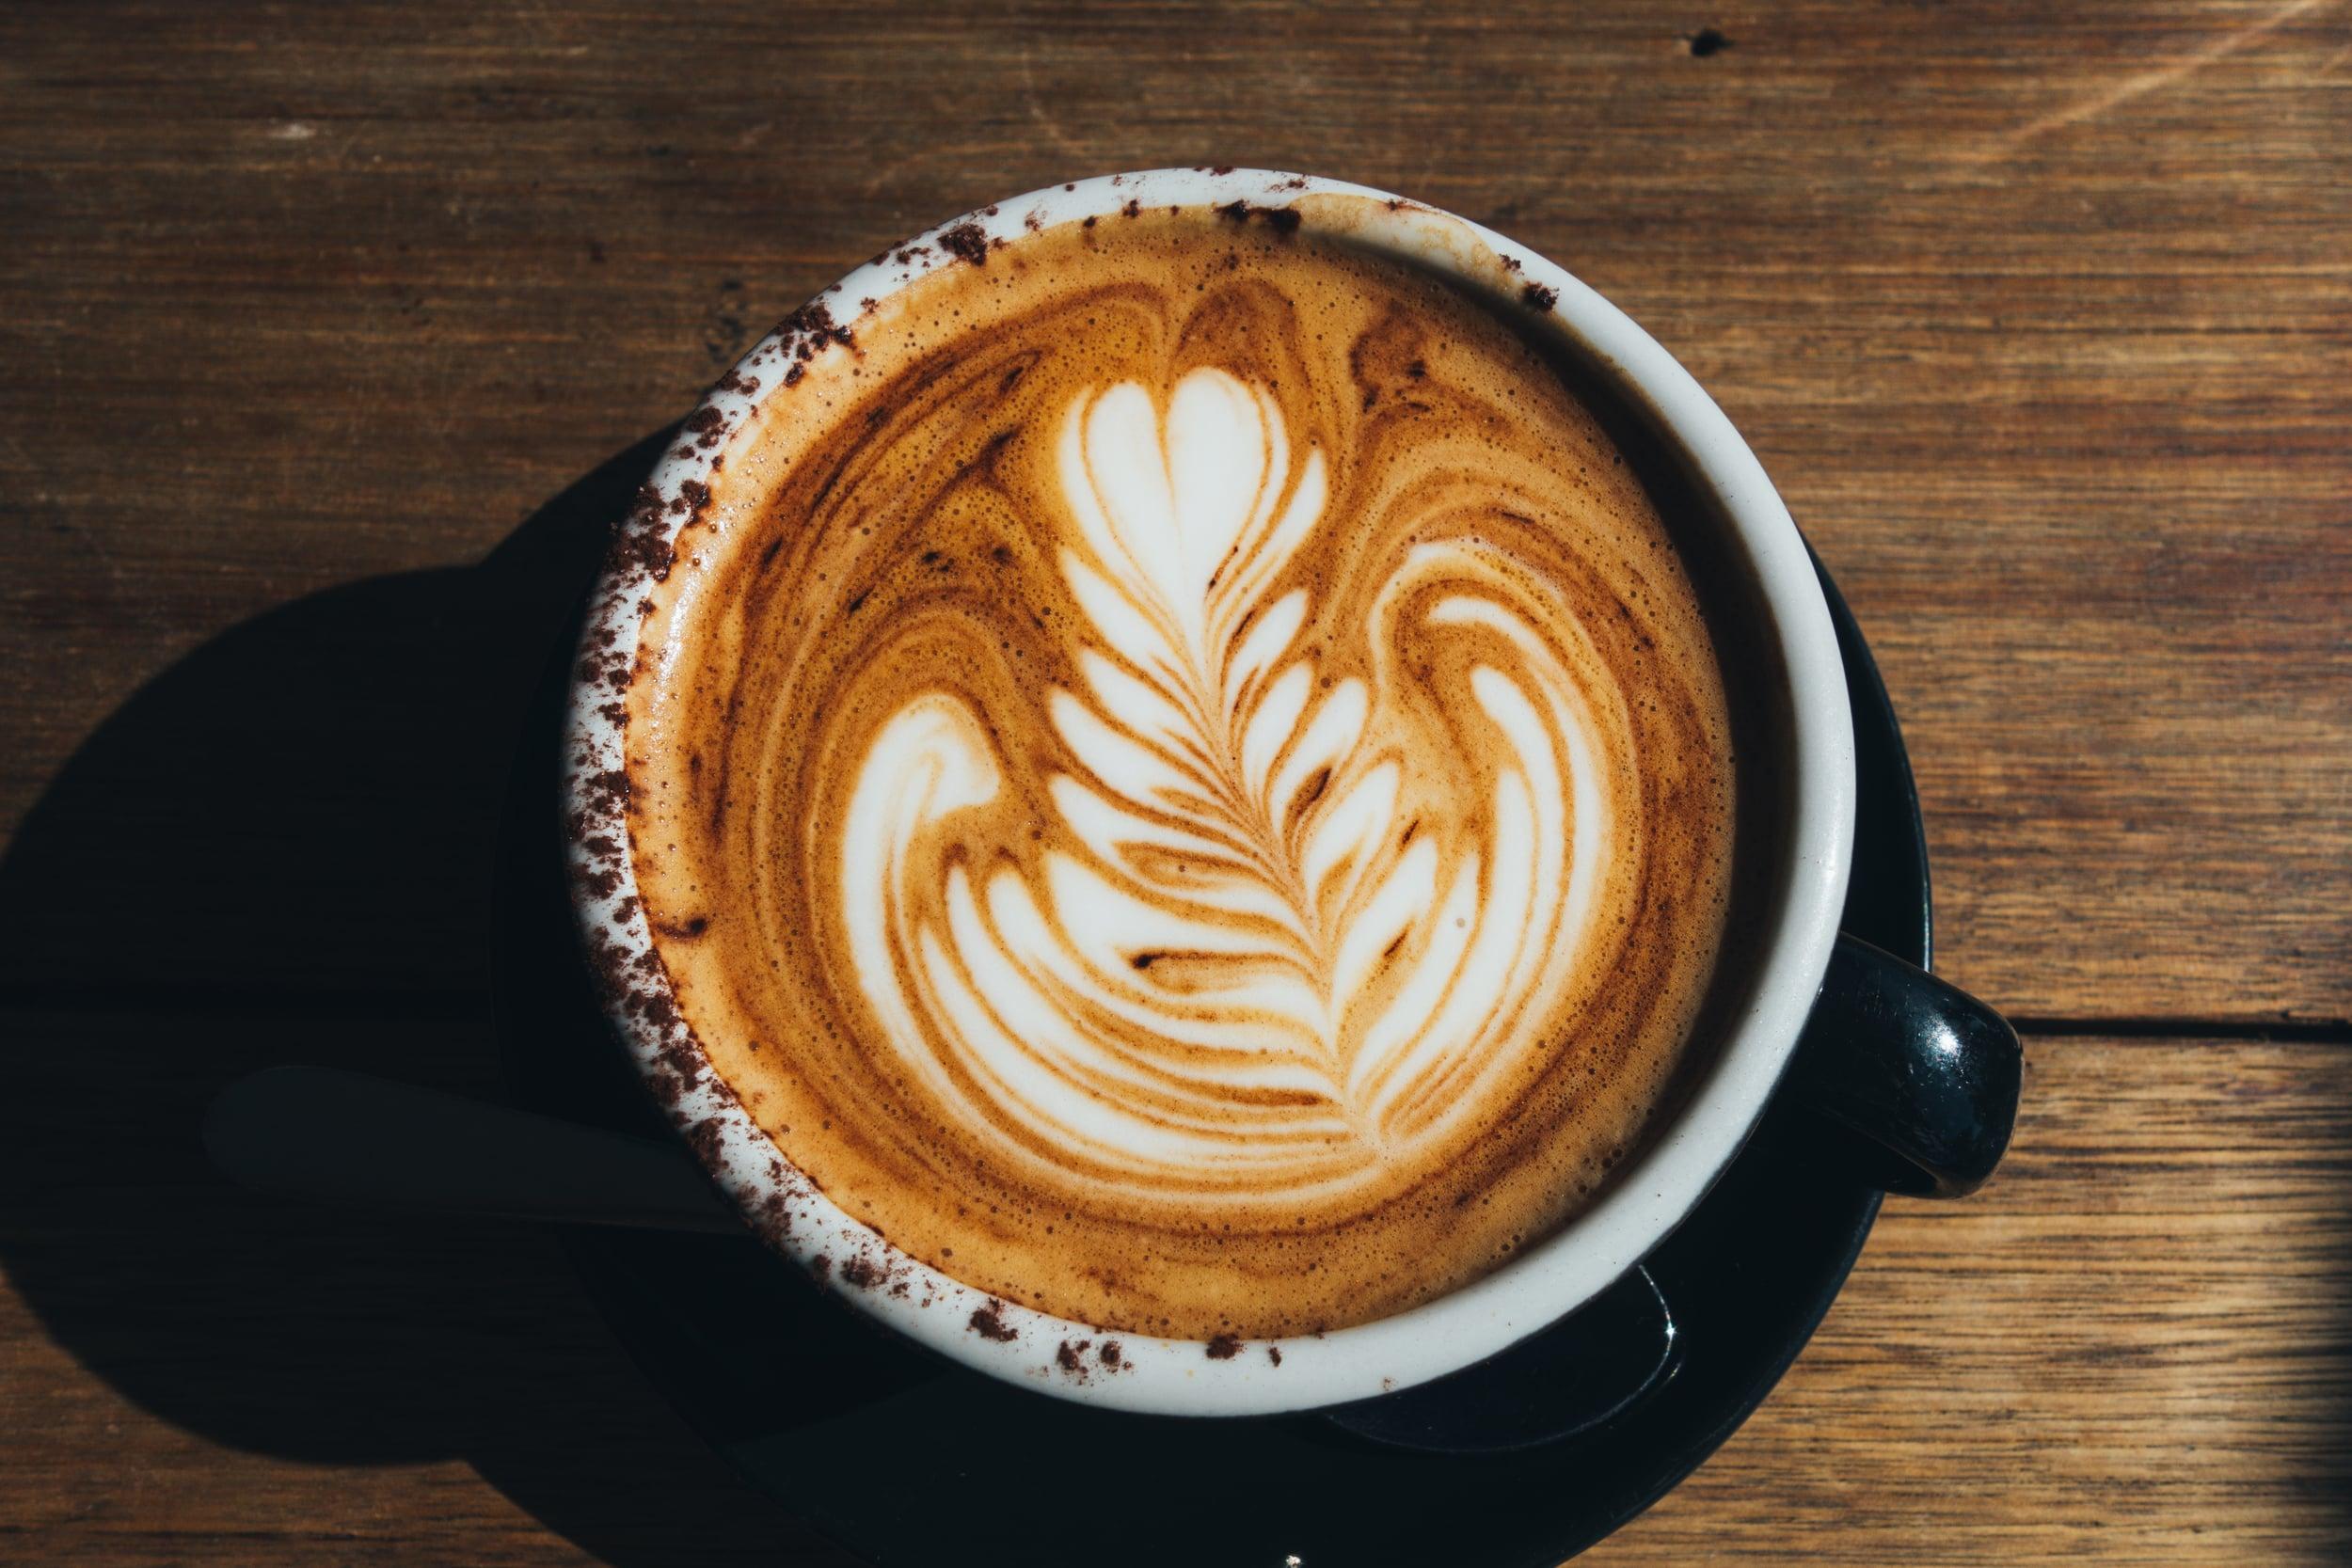 pond torquay cappuccino